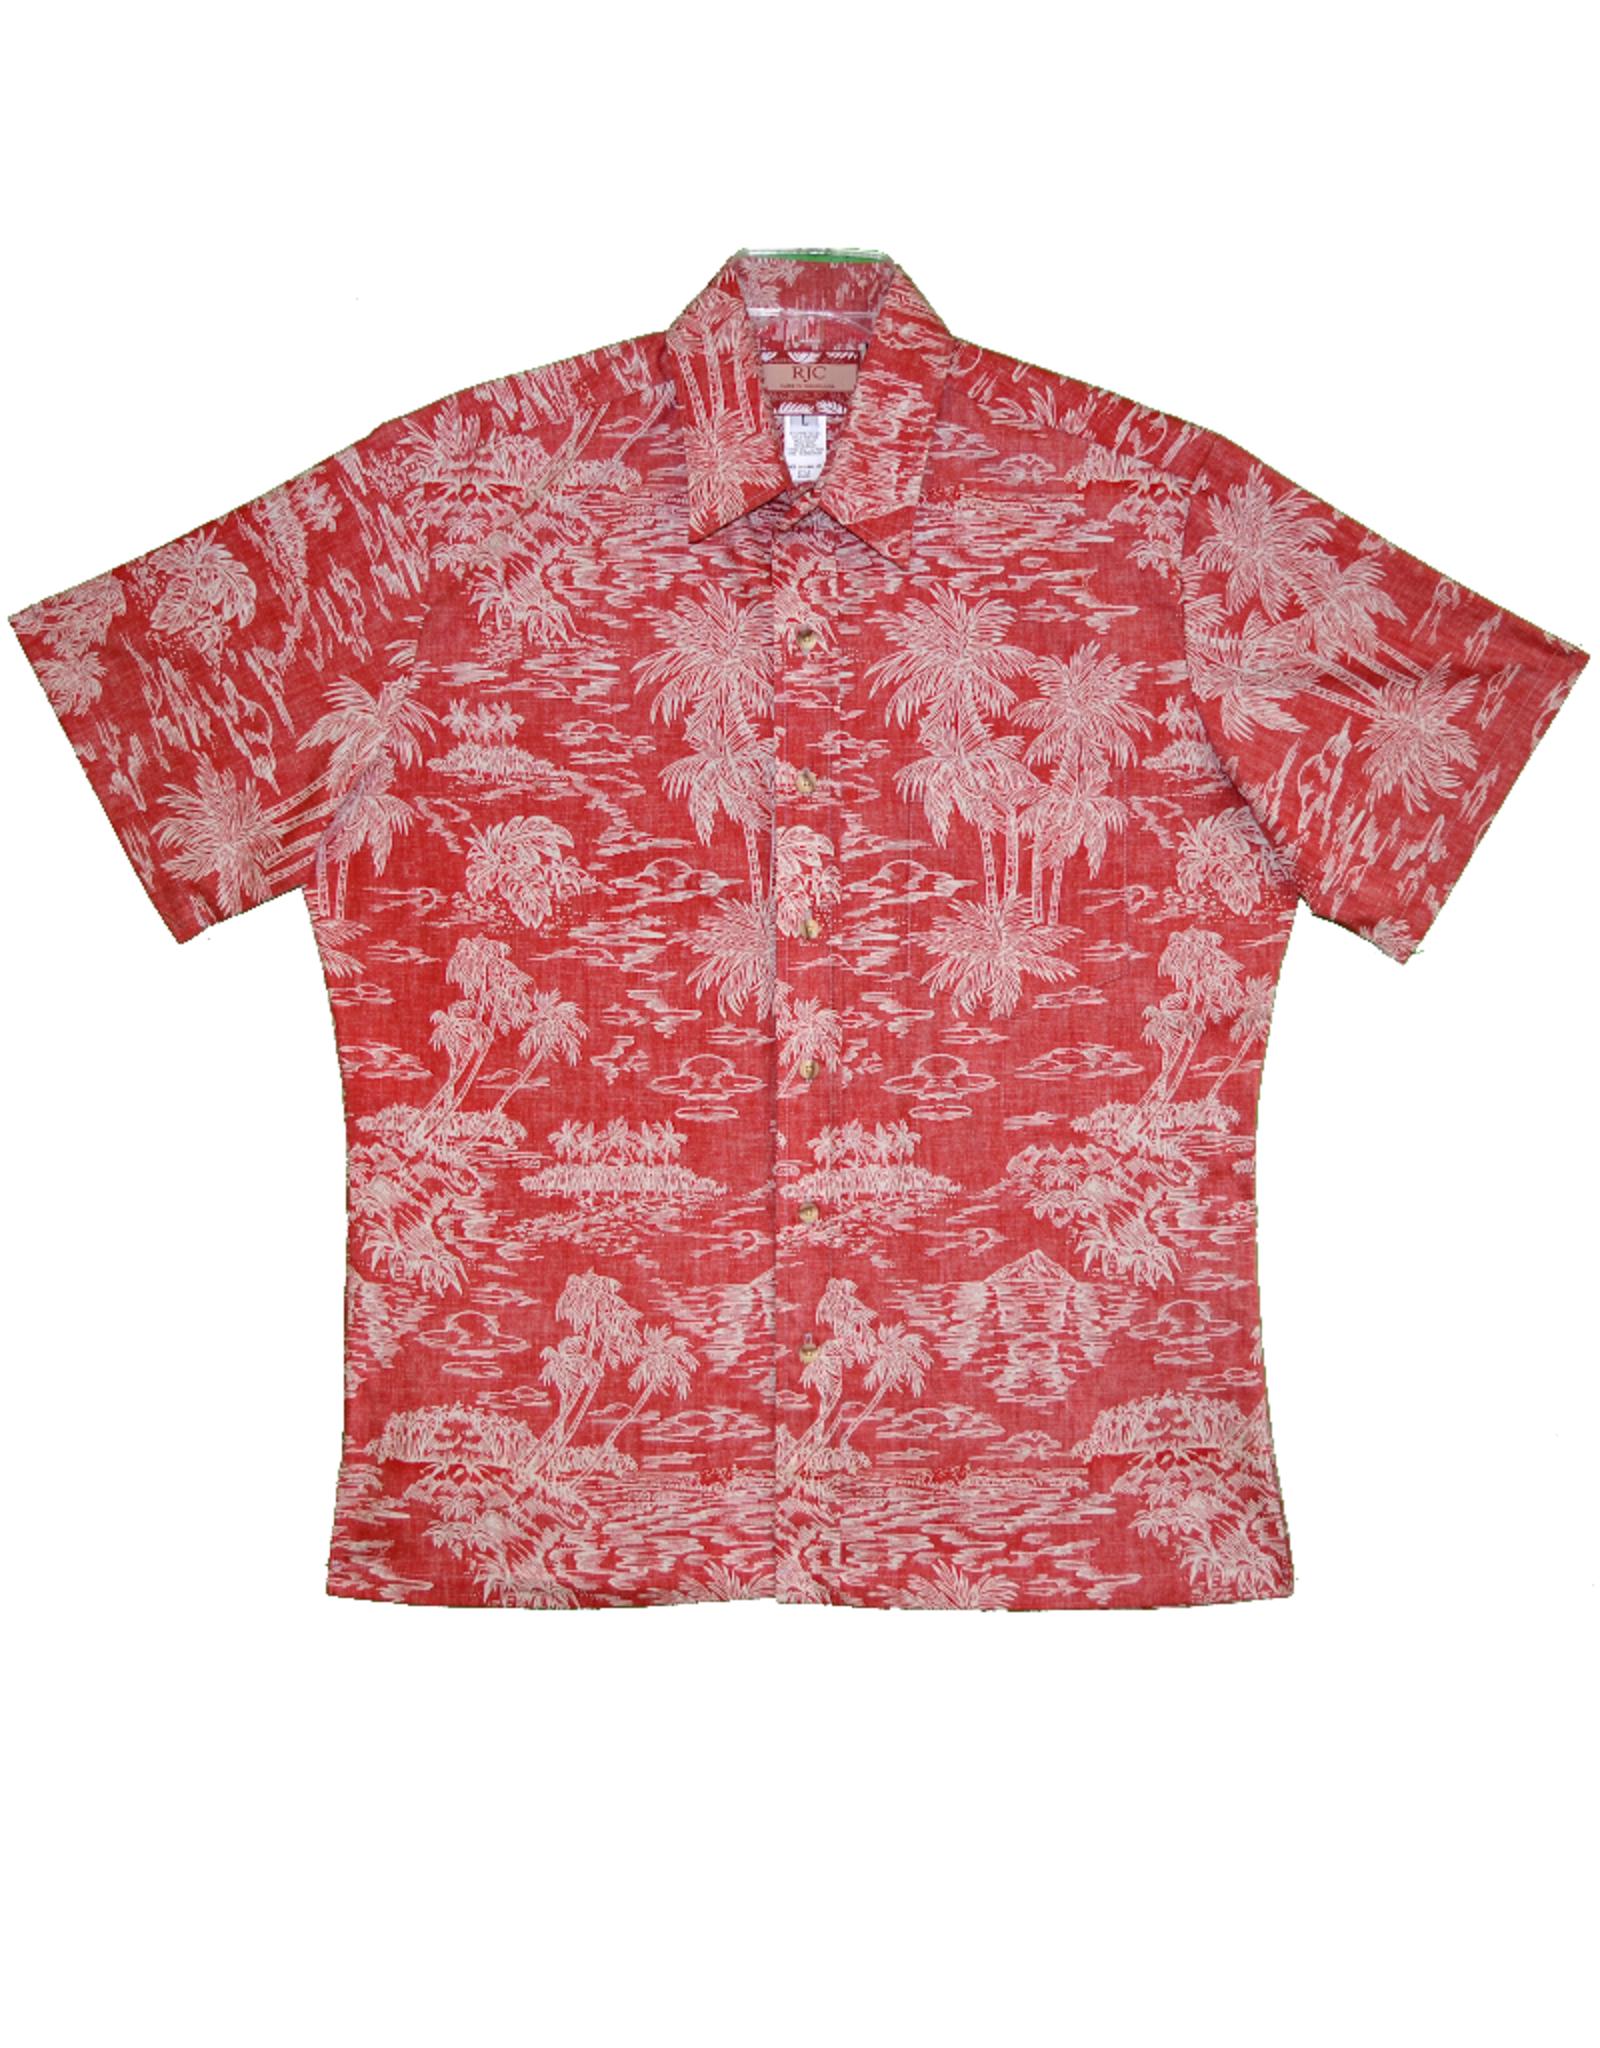 Robert J. Clancey Hawaiian Shirt 8308C.1159